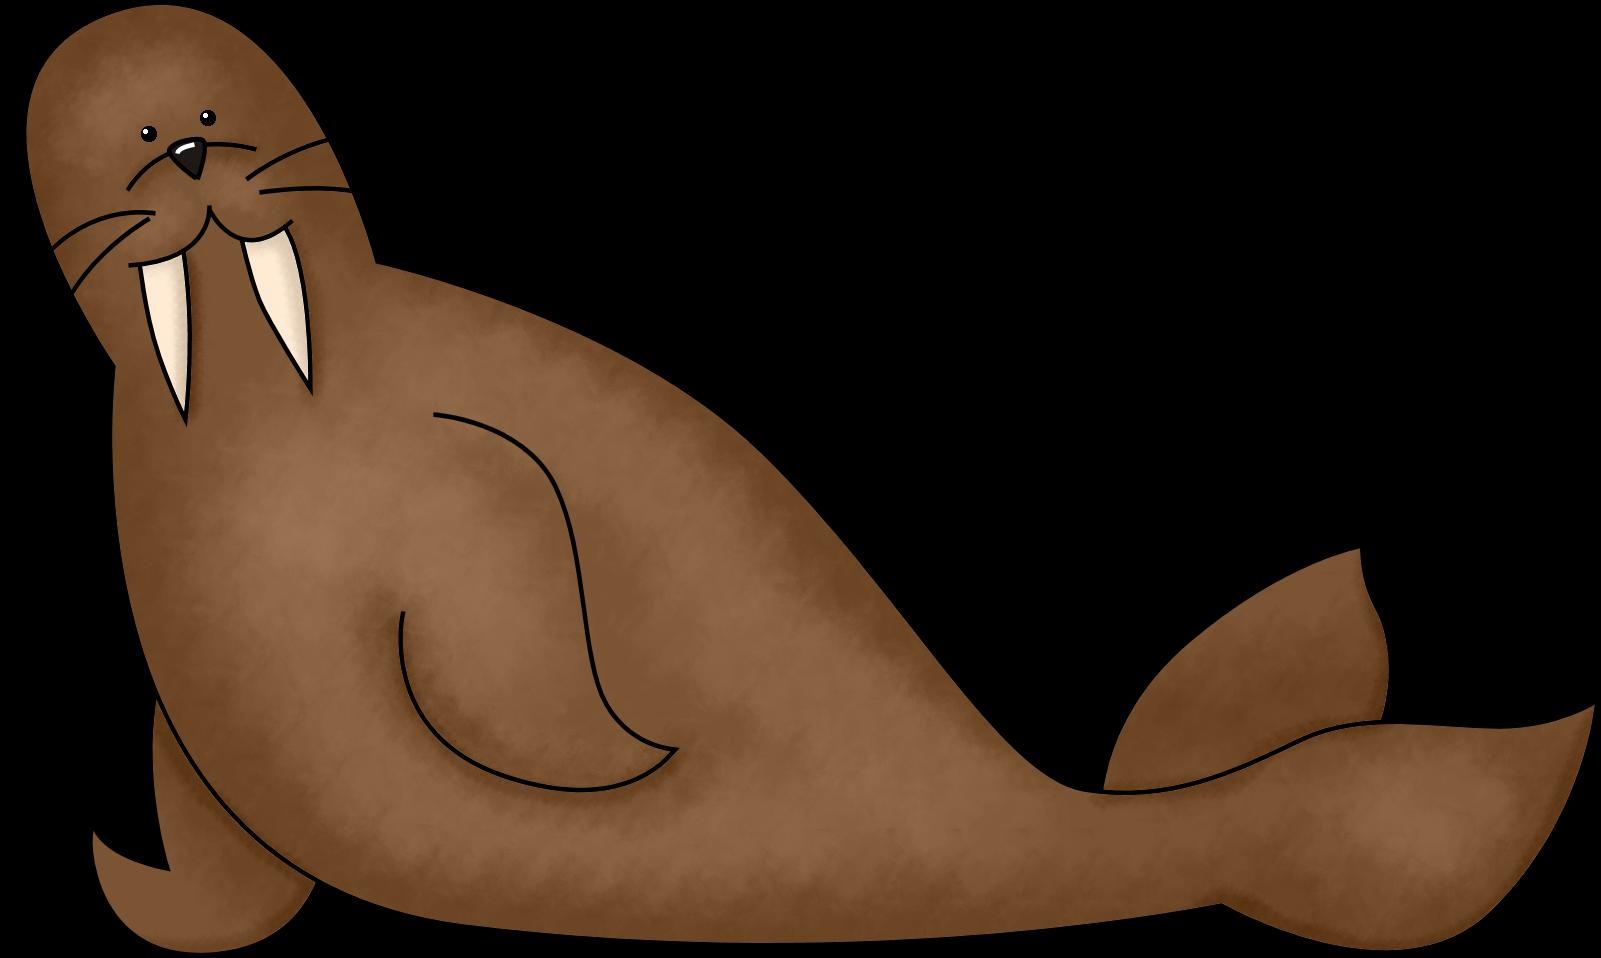 Seal clipground clip art. Walrus clipart swimming